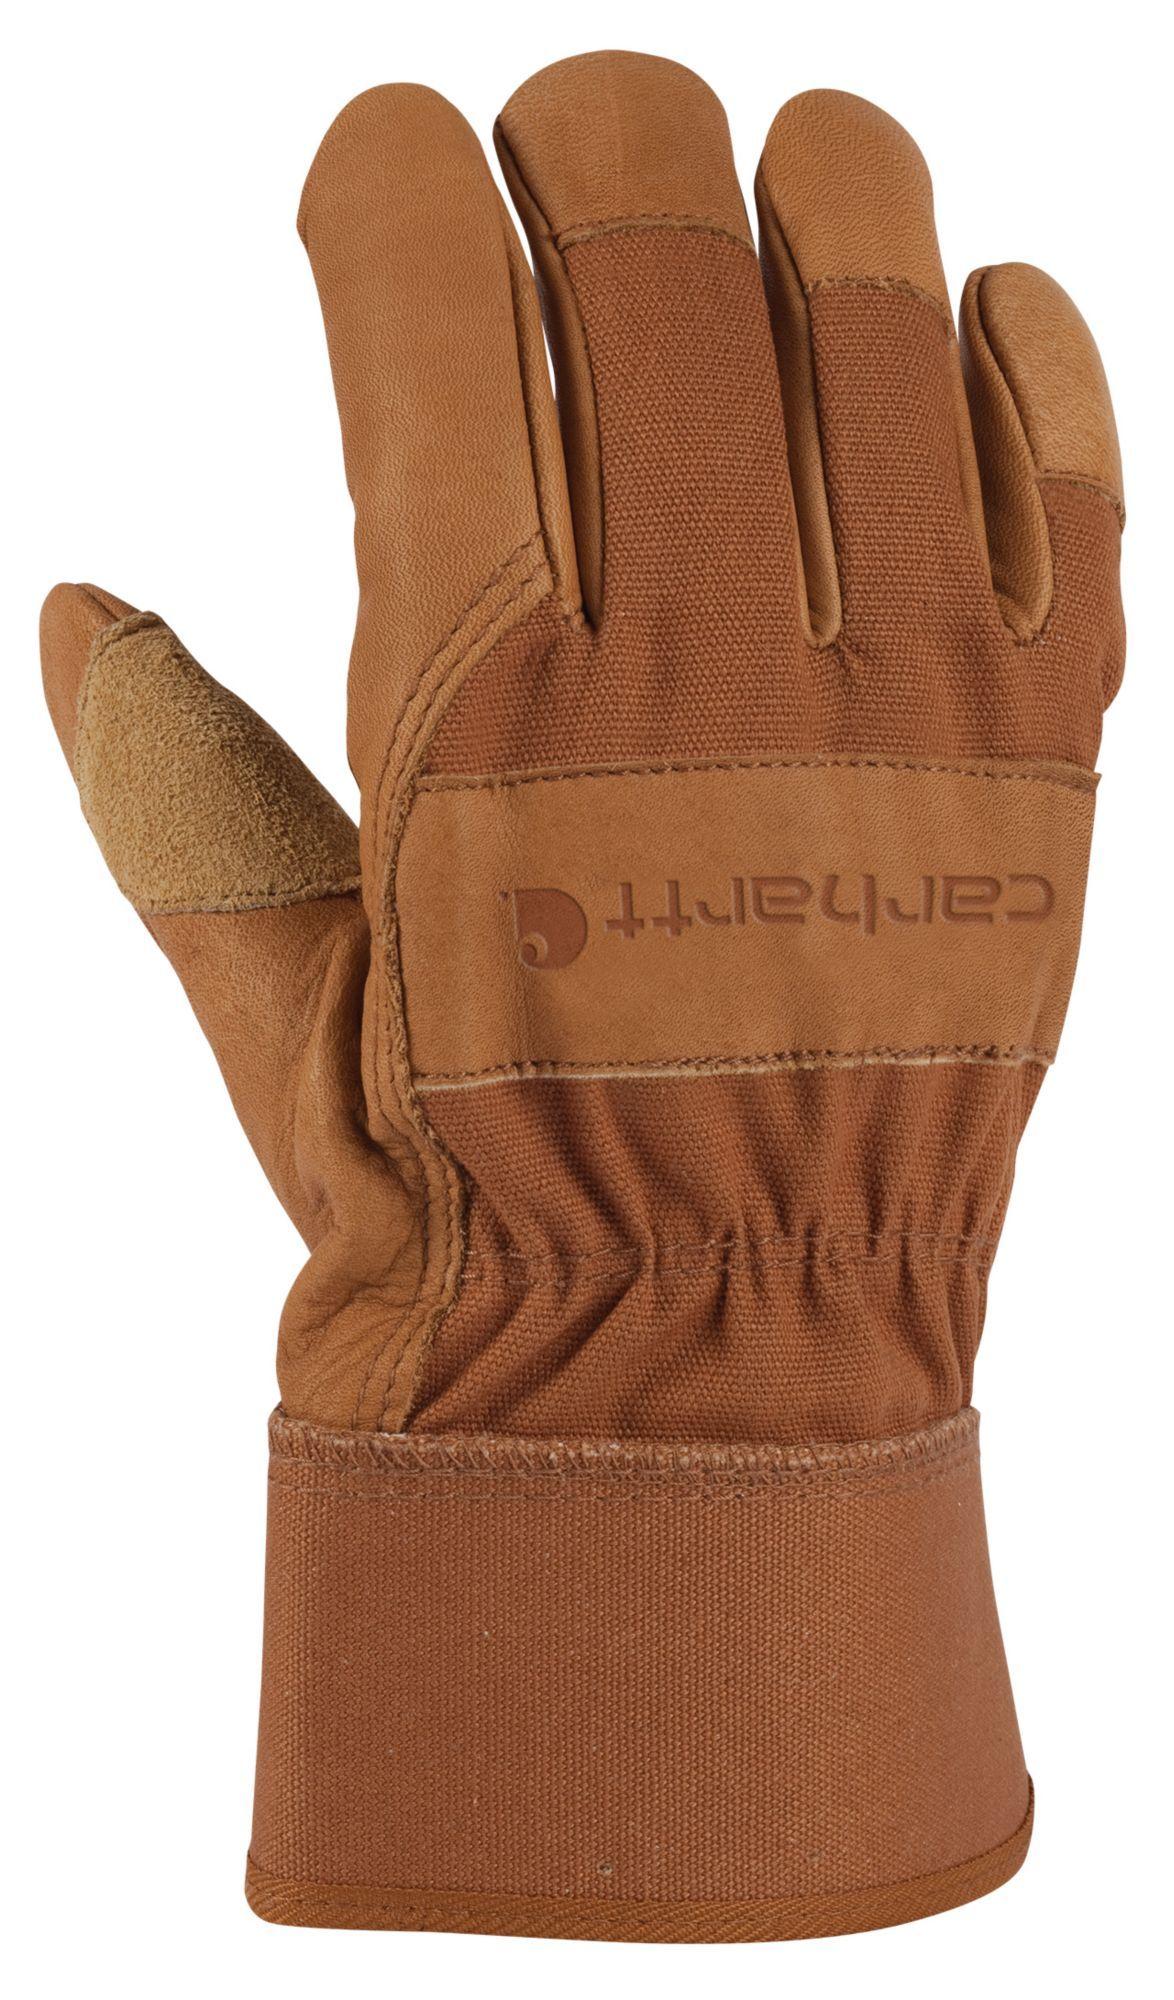 Leather work gloves drawstring - Pinterest Leather Work Gloves 1 000